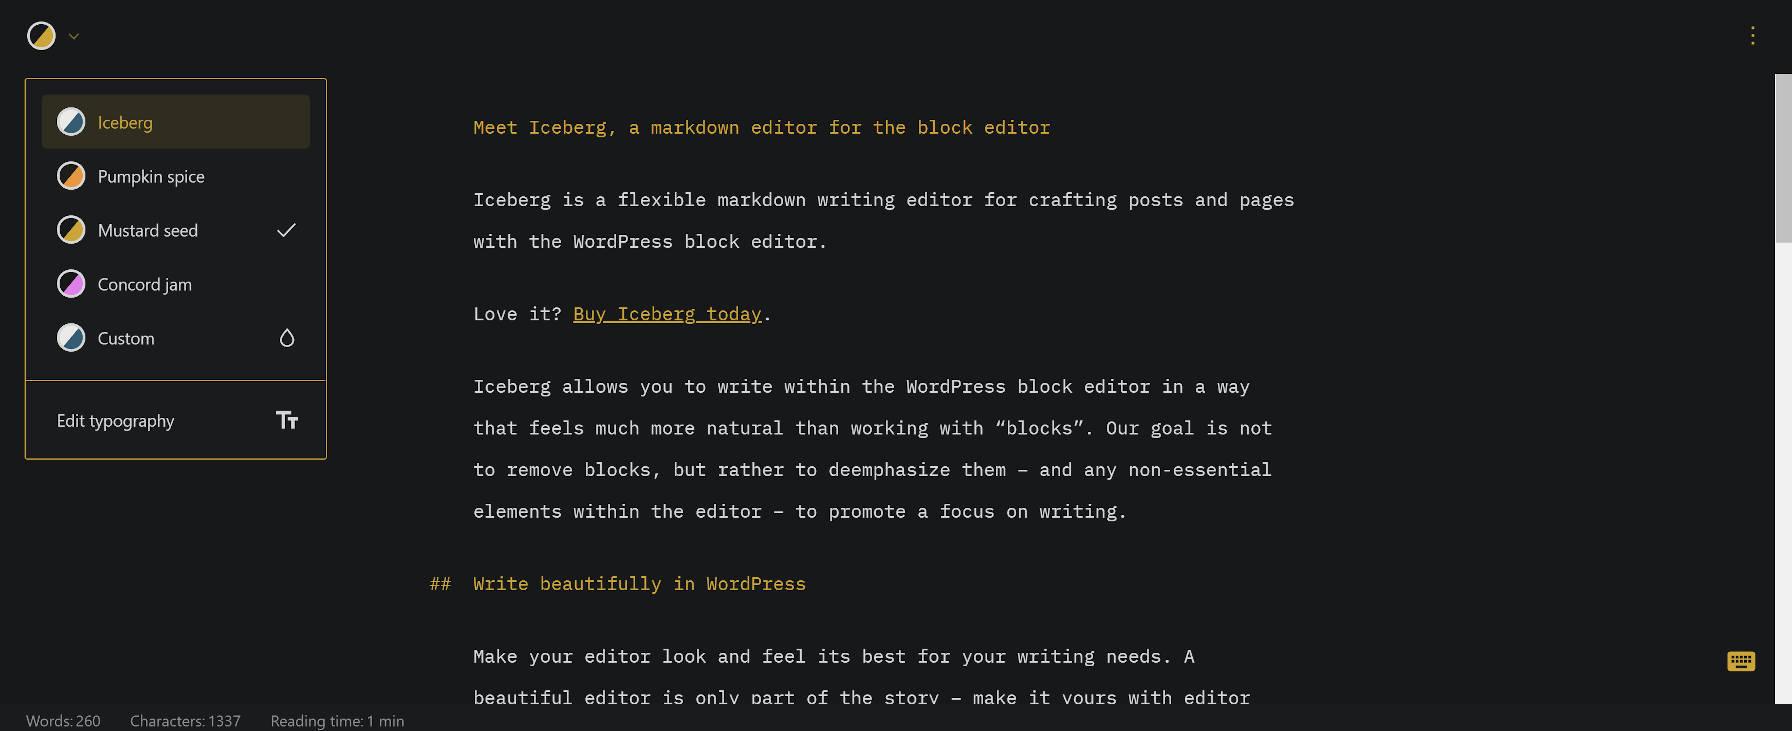 Iceberg Editor plugin, showcasing its Markdown editing features.